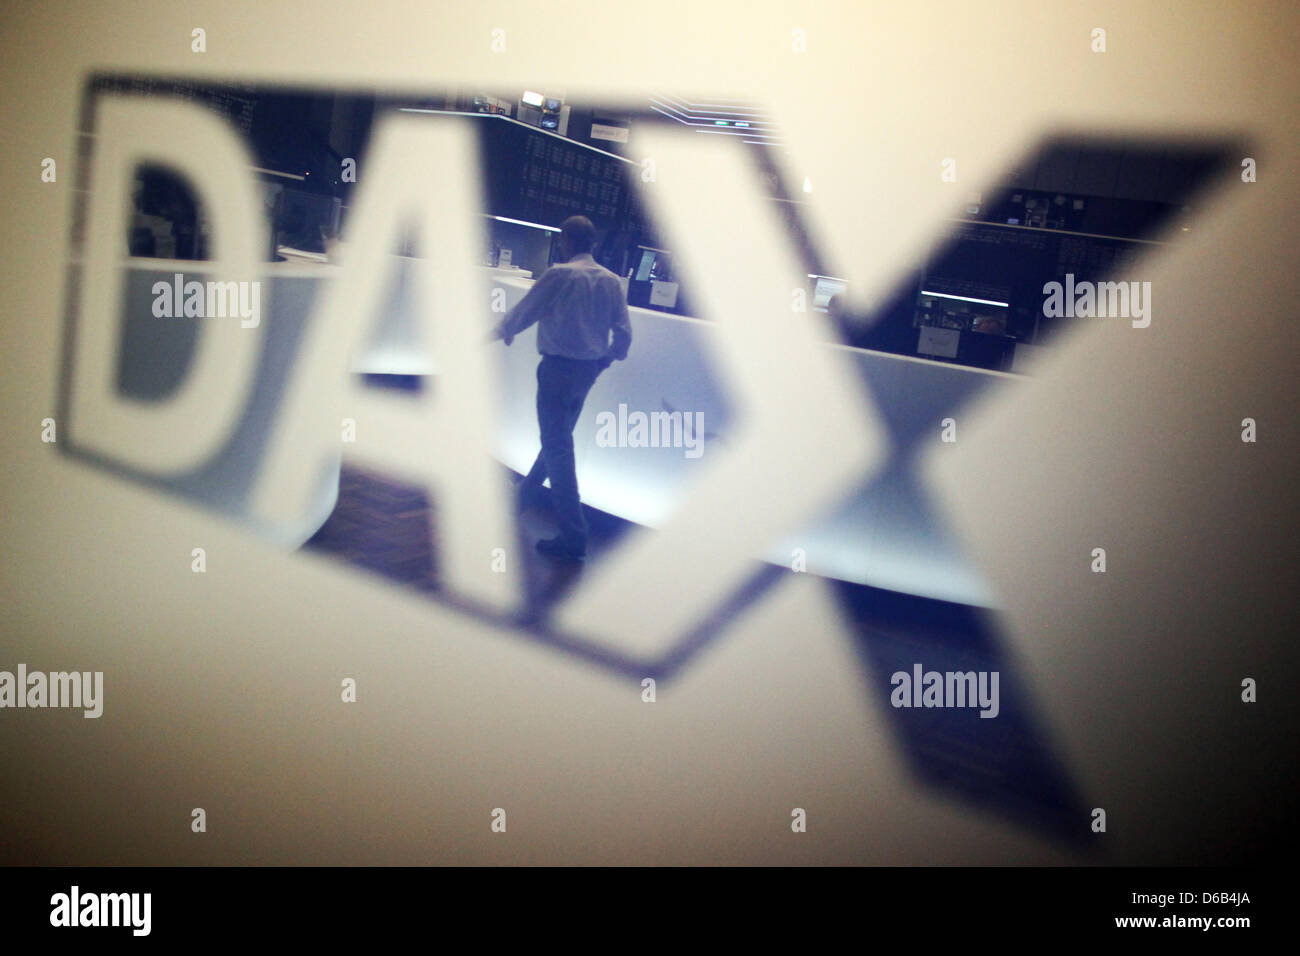 Dax Stock Market Stock Photos Dax Stock Market Stock Images Alamy